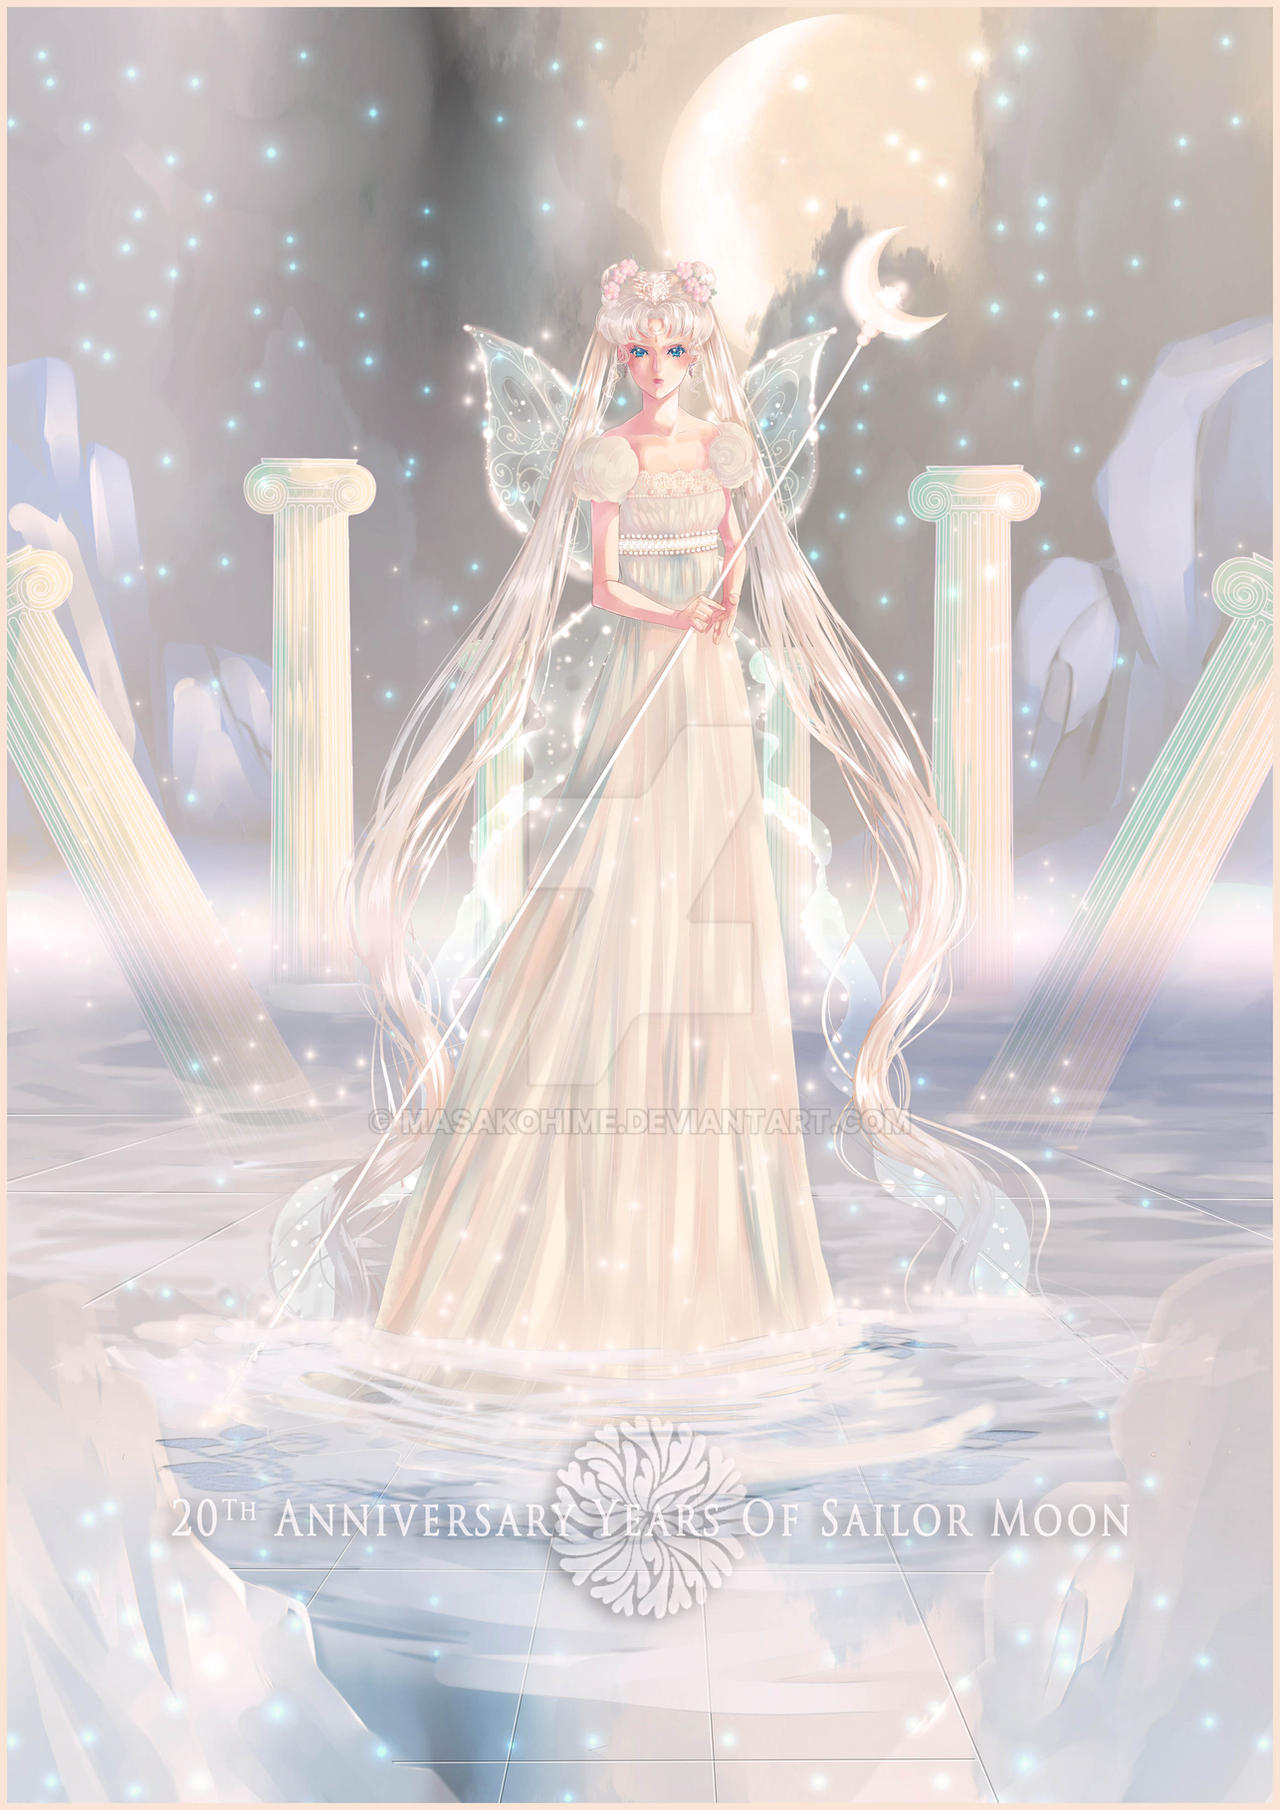 Princess Serenity by MasakoHime